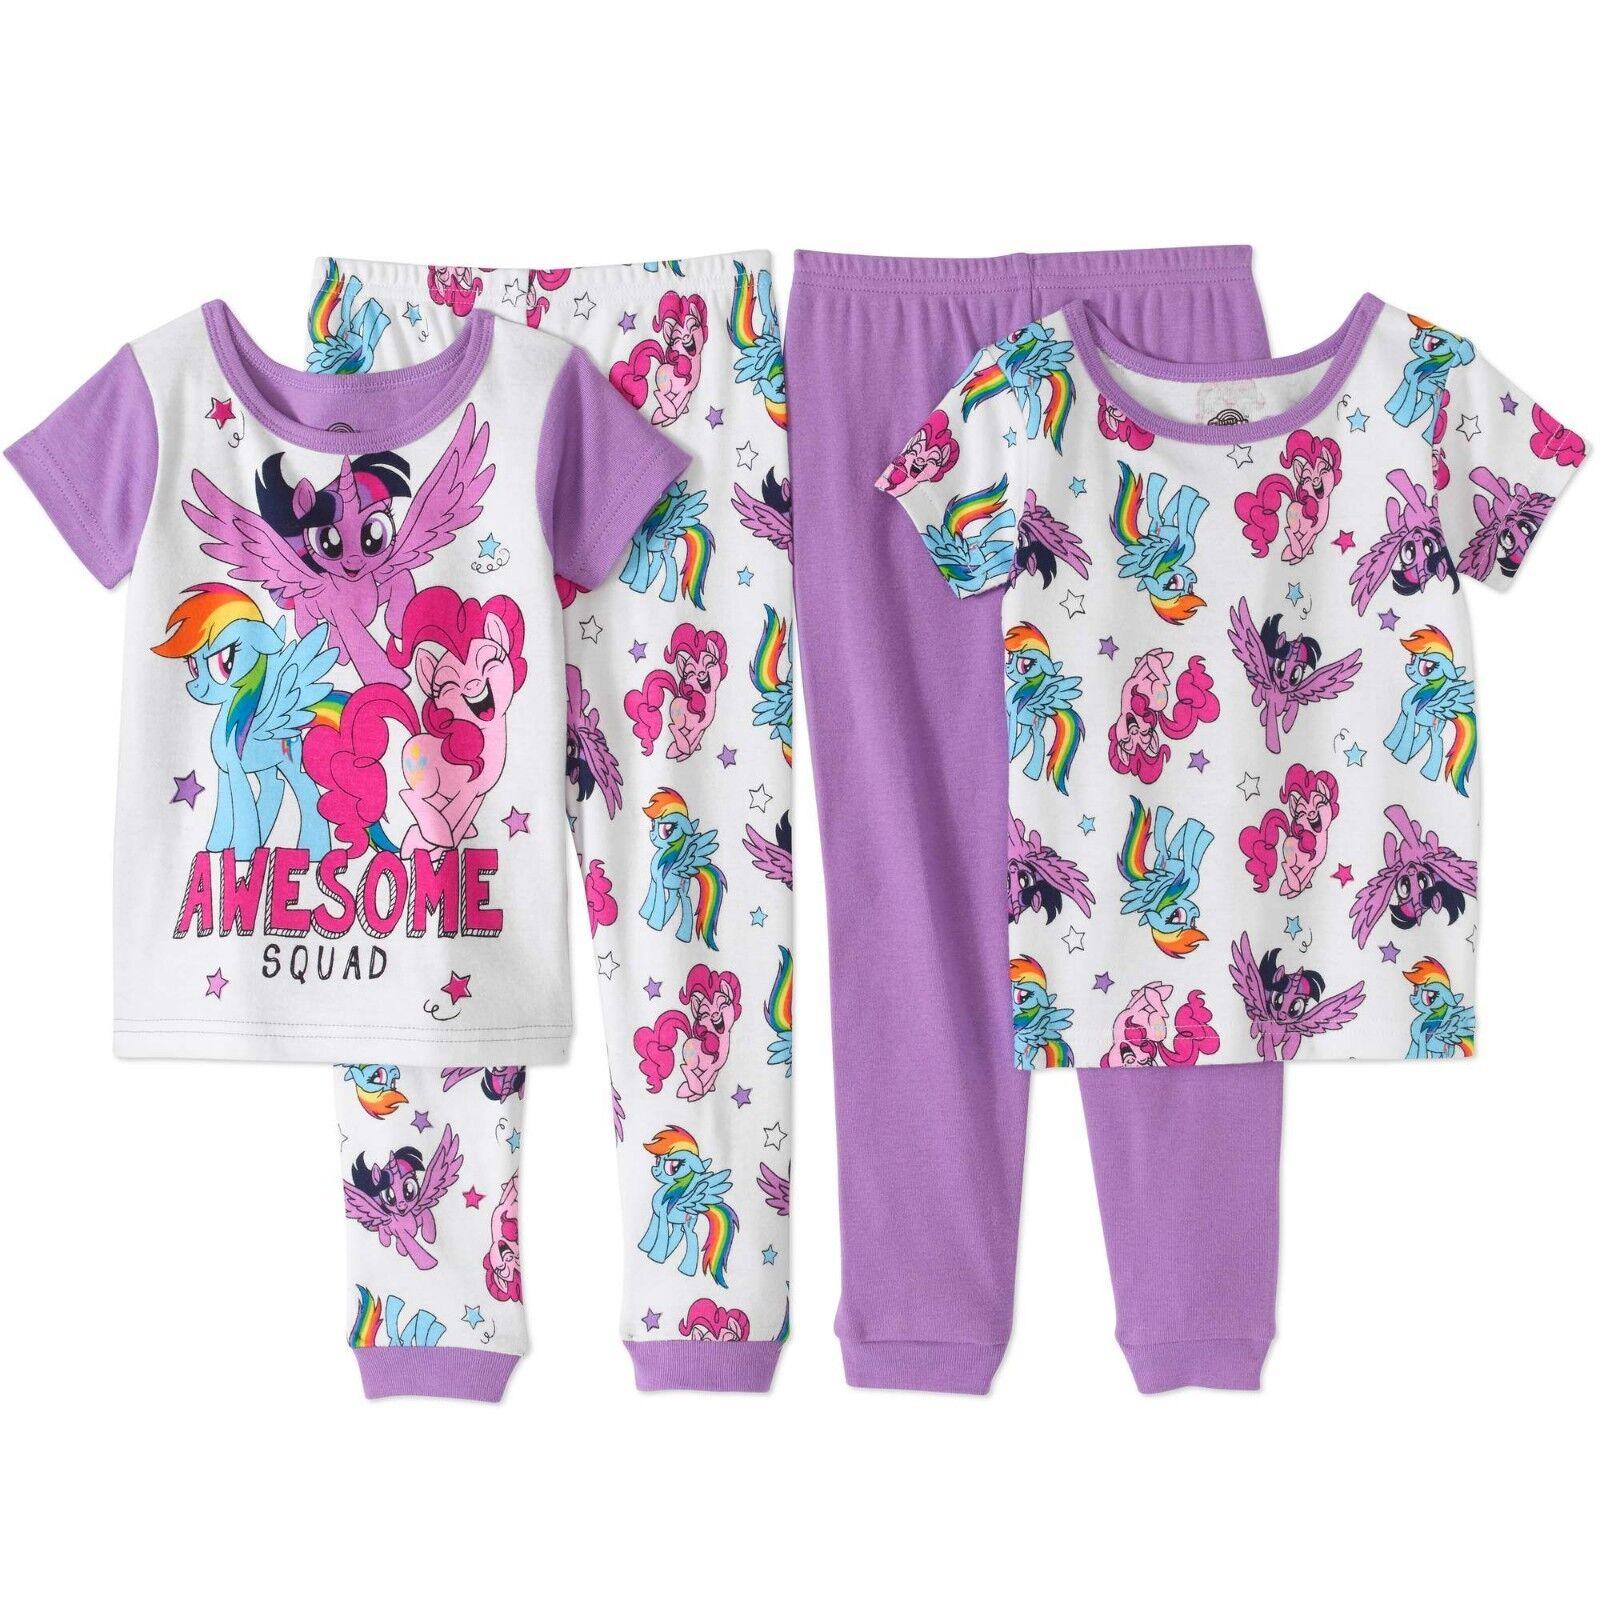 My Little Pony 4 PC Short Sleeve Tight Fit Cotton Pajama Set